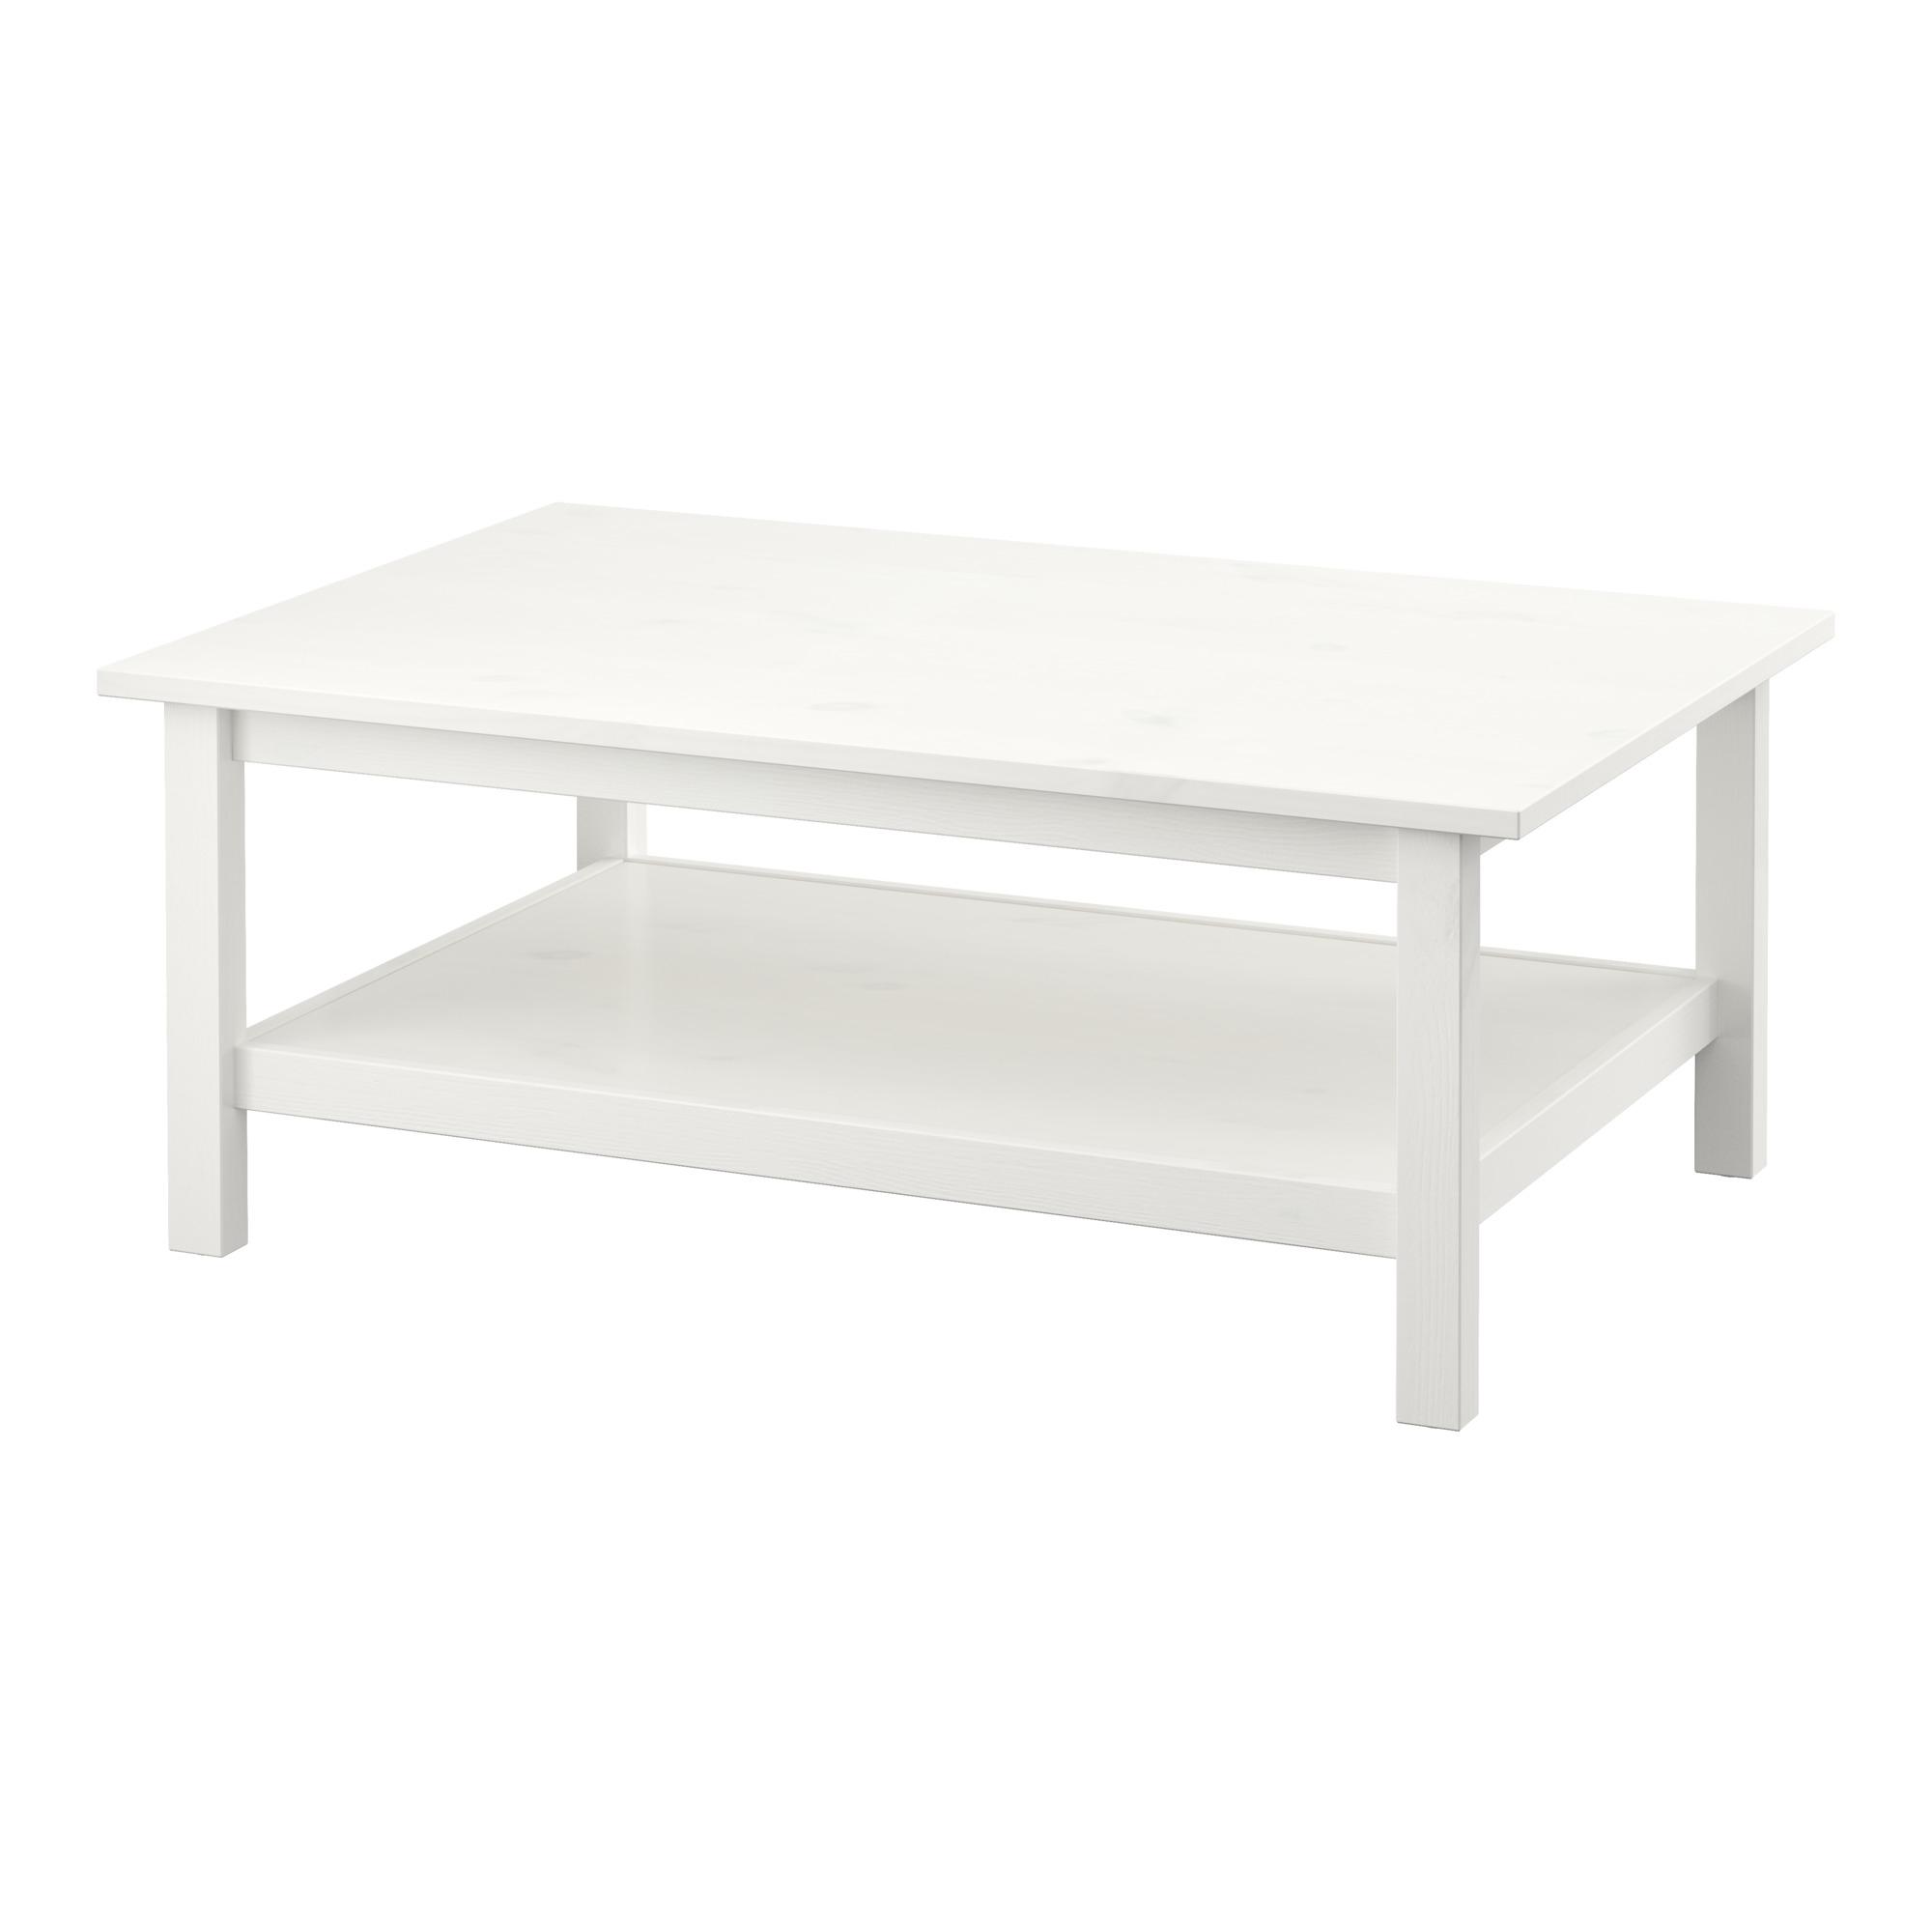 Dormitorio muebles modernos mesa hemnes ikea - Mesas tv ikea ...